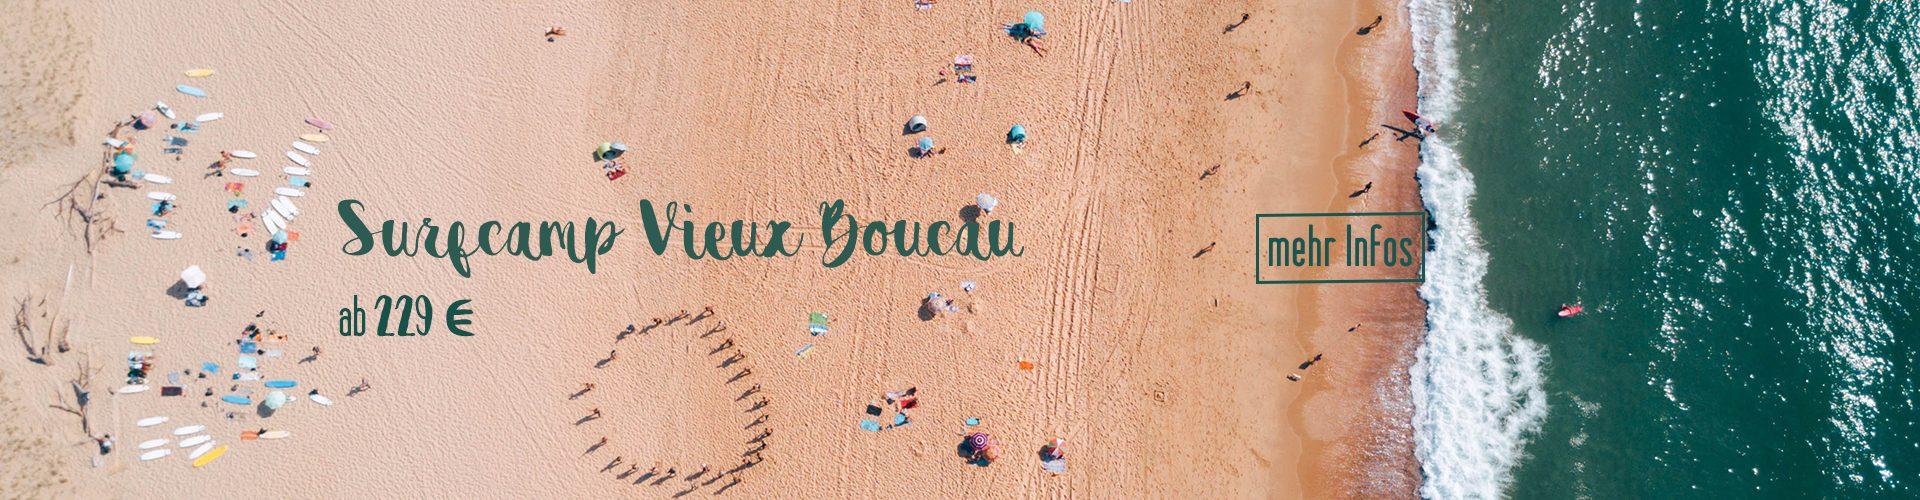 Surfcamp Vieux Boucau